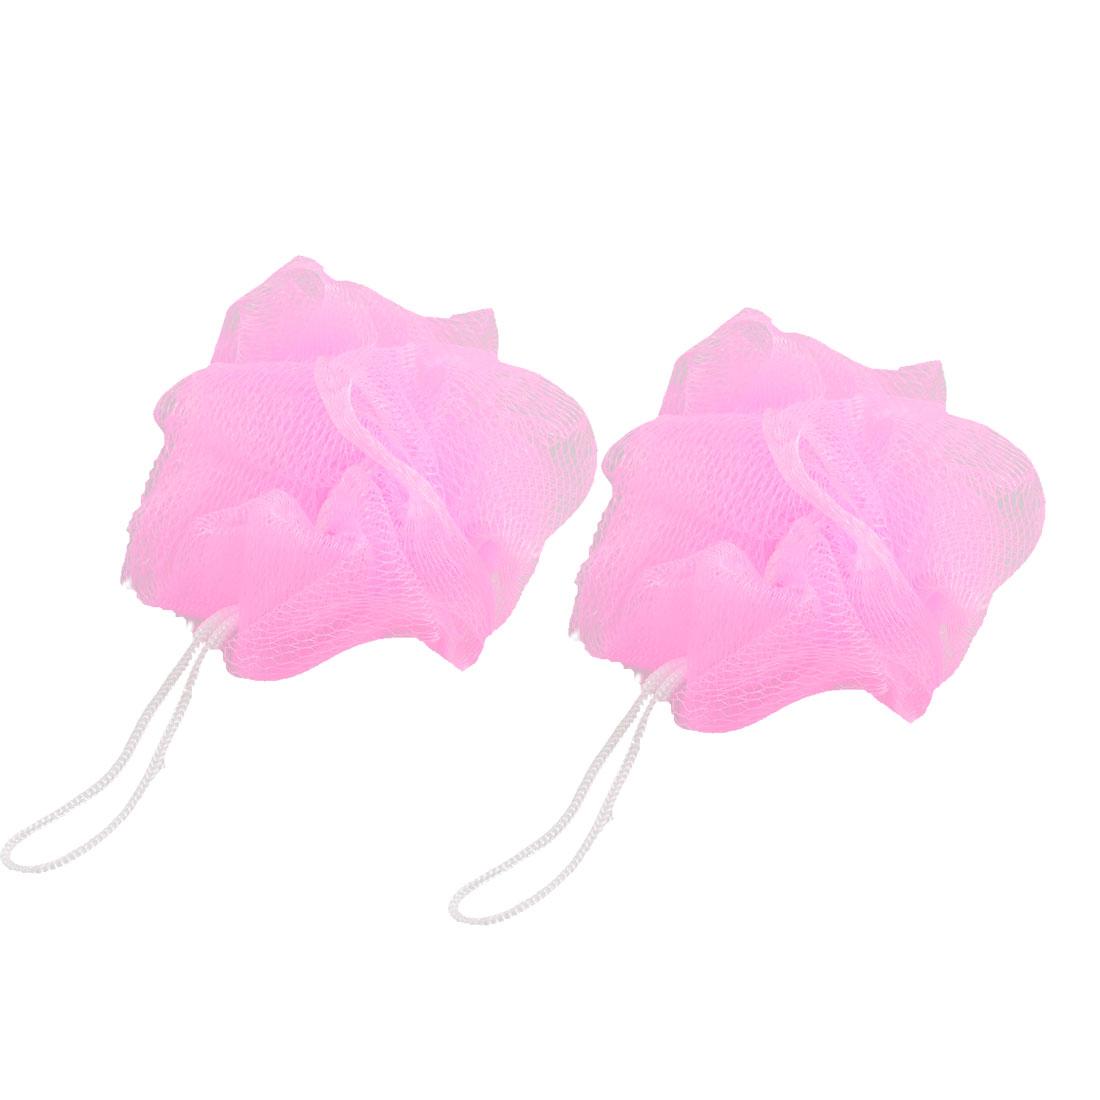 2 Pcs Mesh Pouf Shower Body Cleaning Fine Bath Ball Pink